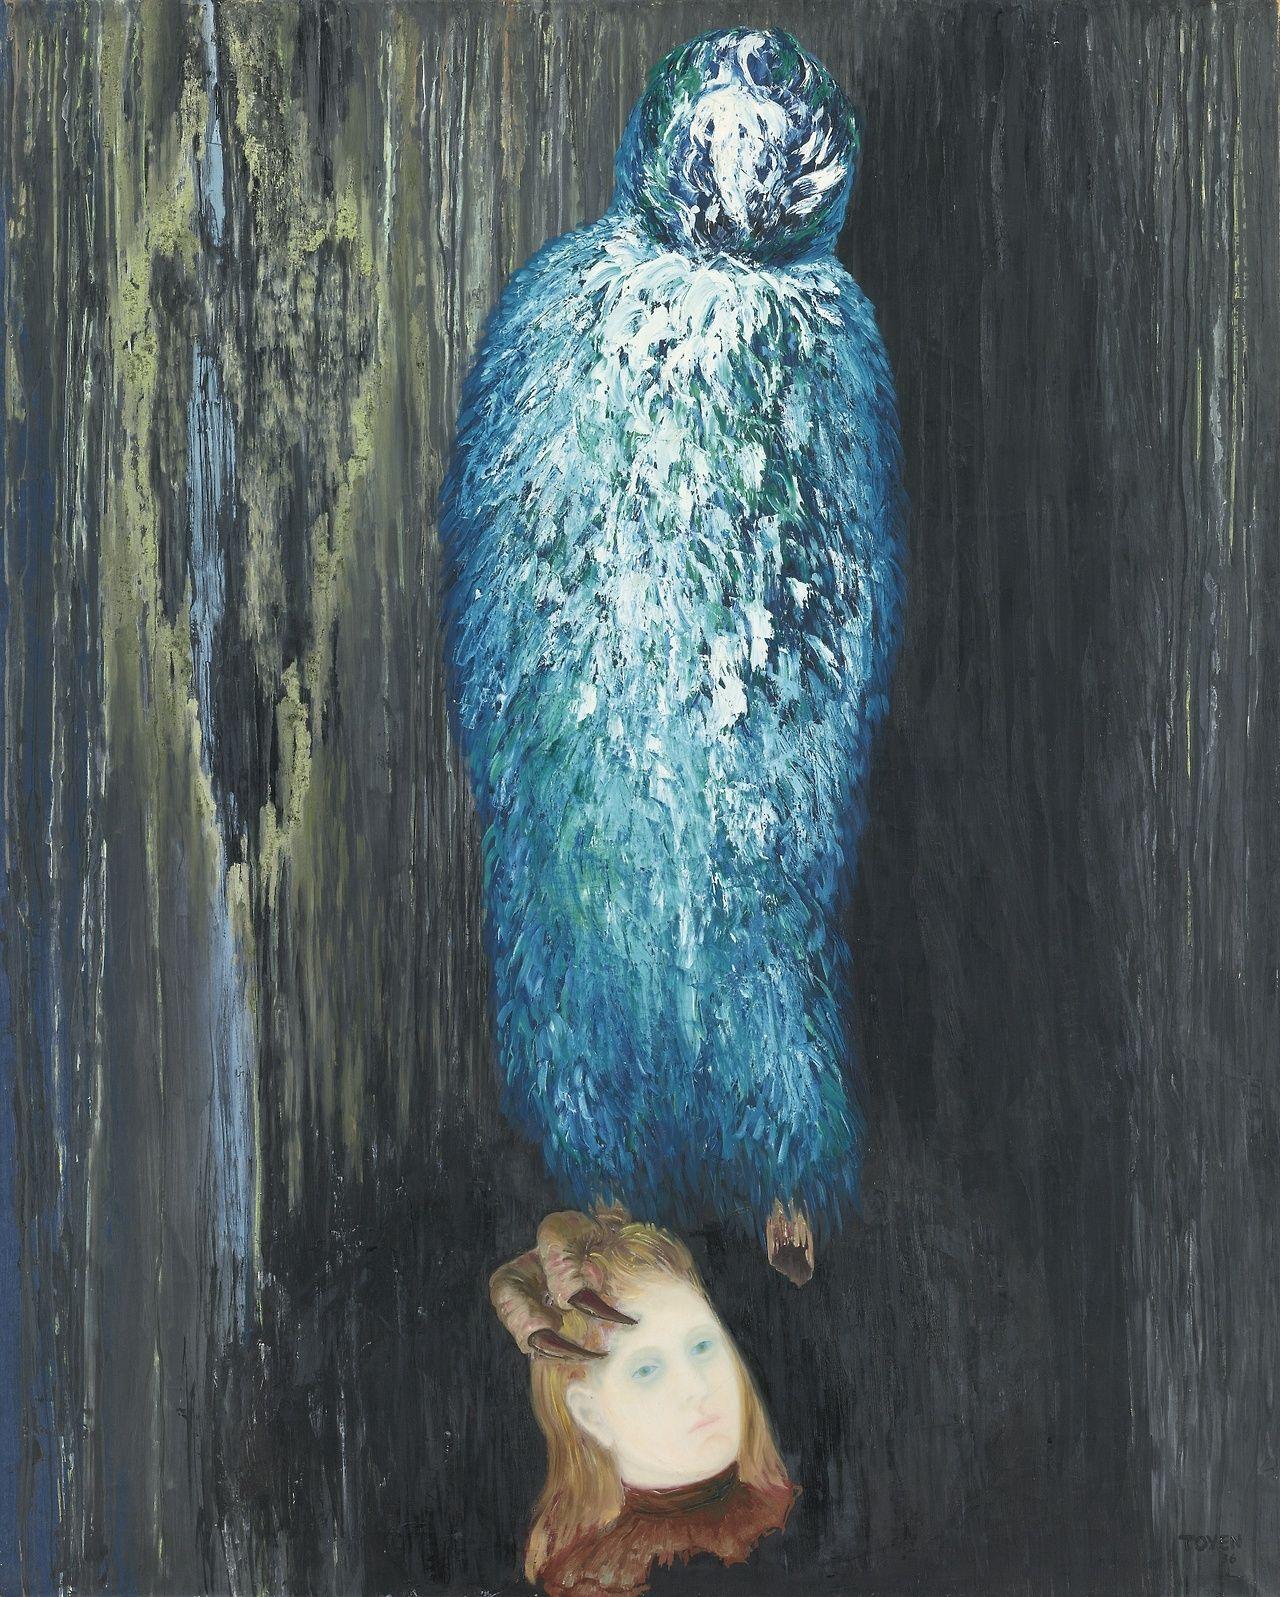 Toyen (Marie Čermínová) Czech 1902-1980 The Message of the Forest - Poselstivi lesa  (1936) oil on canvas 160 x 129 cm